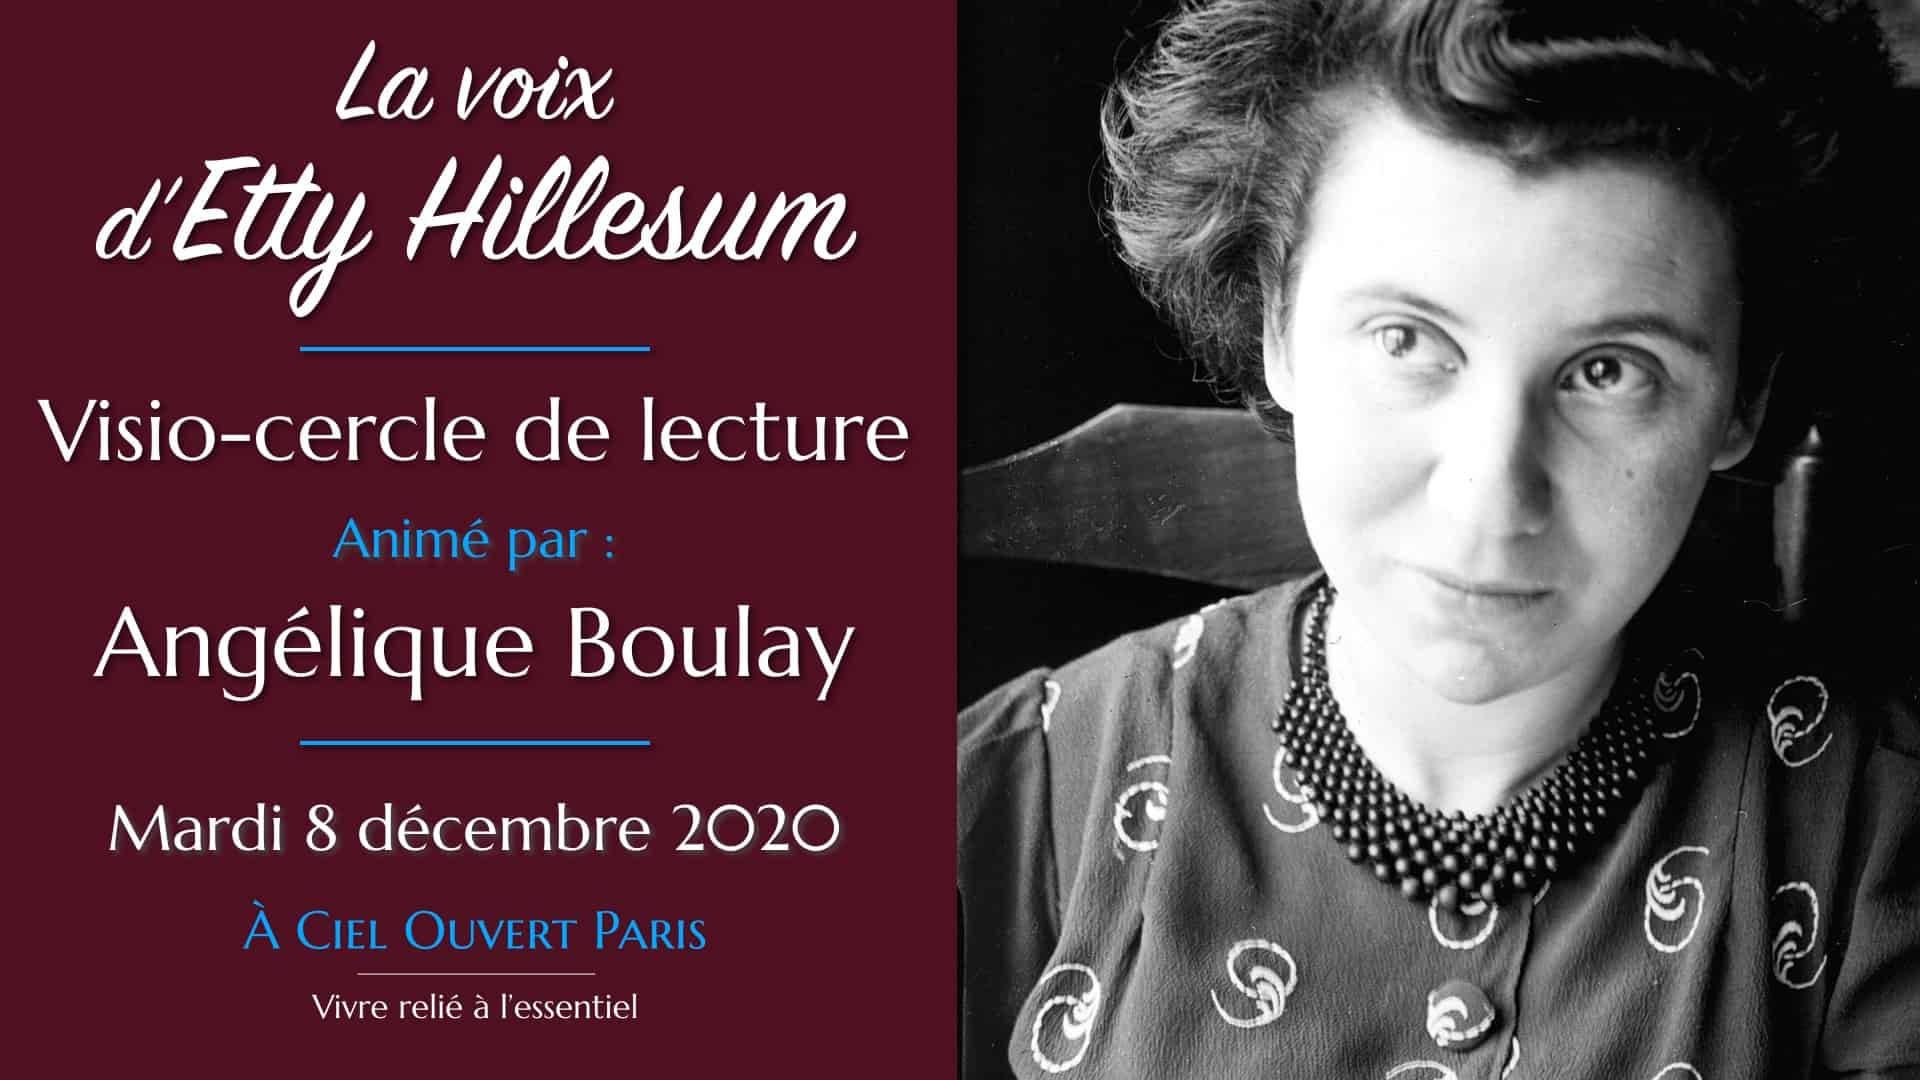 ACOP-Etty_Hillesum-Angelique_Boulay-HD